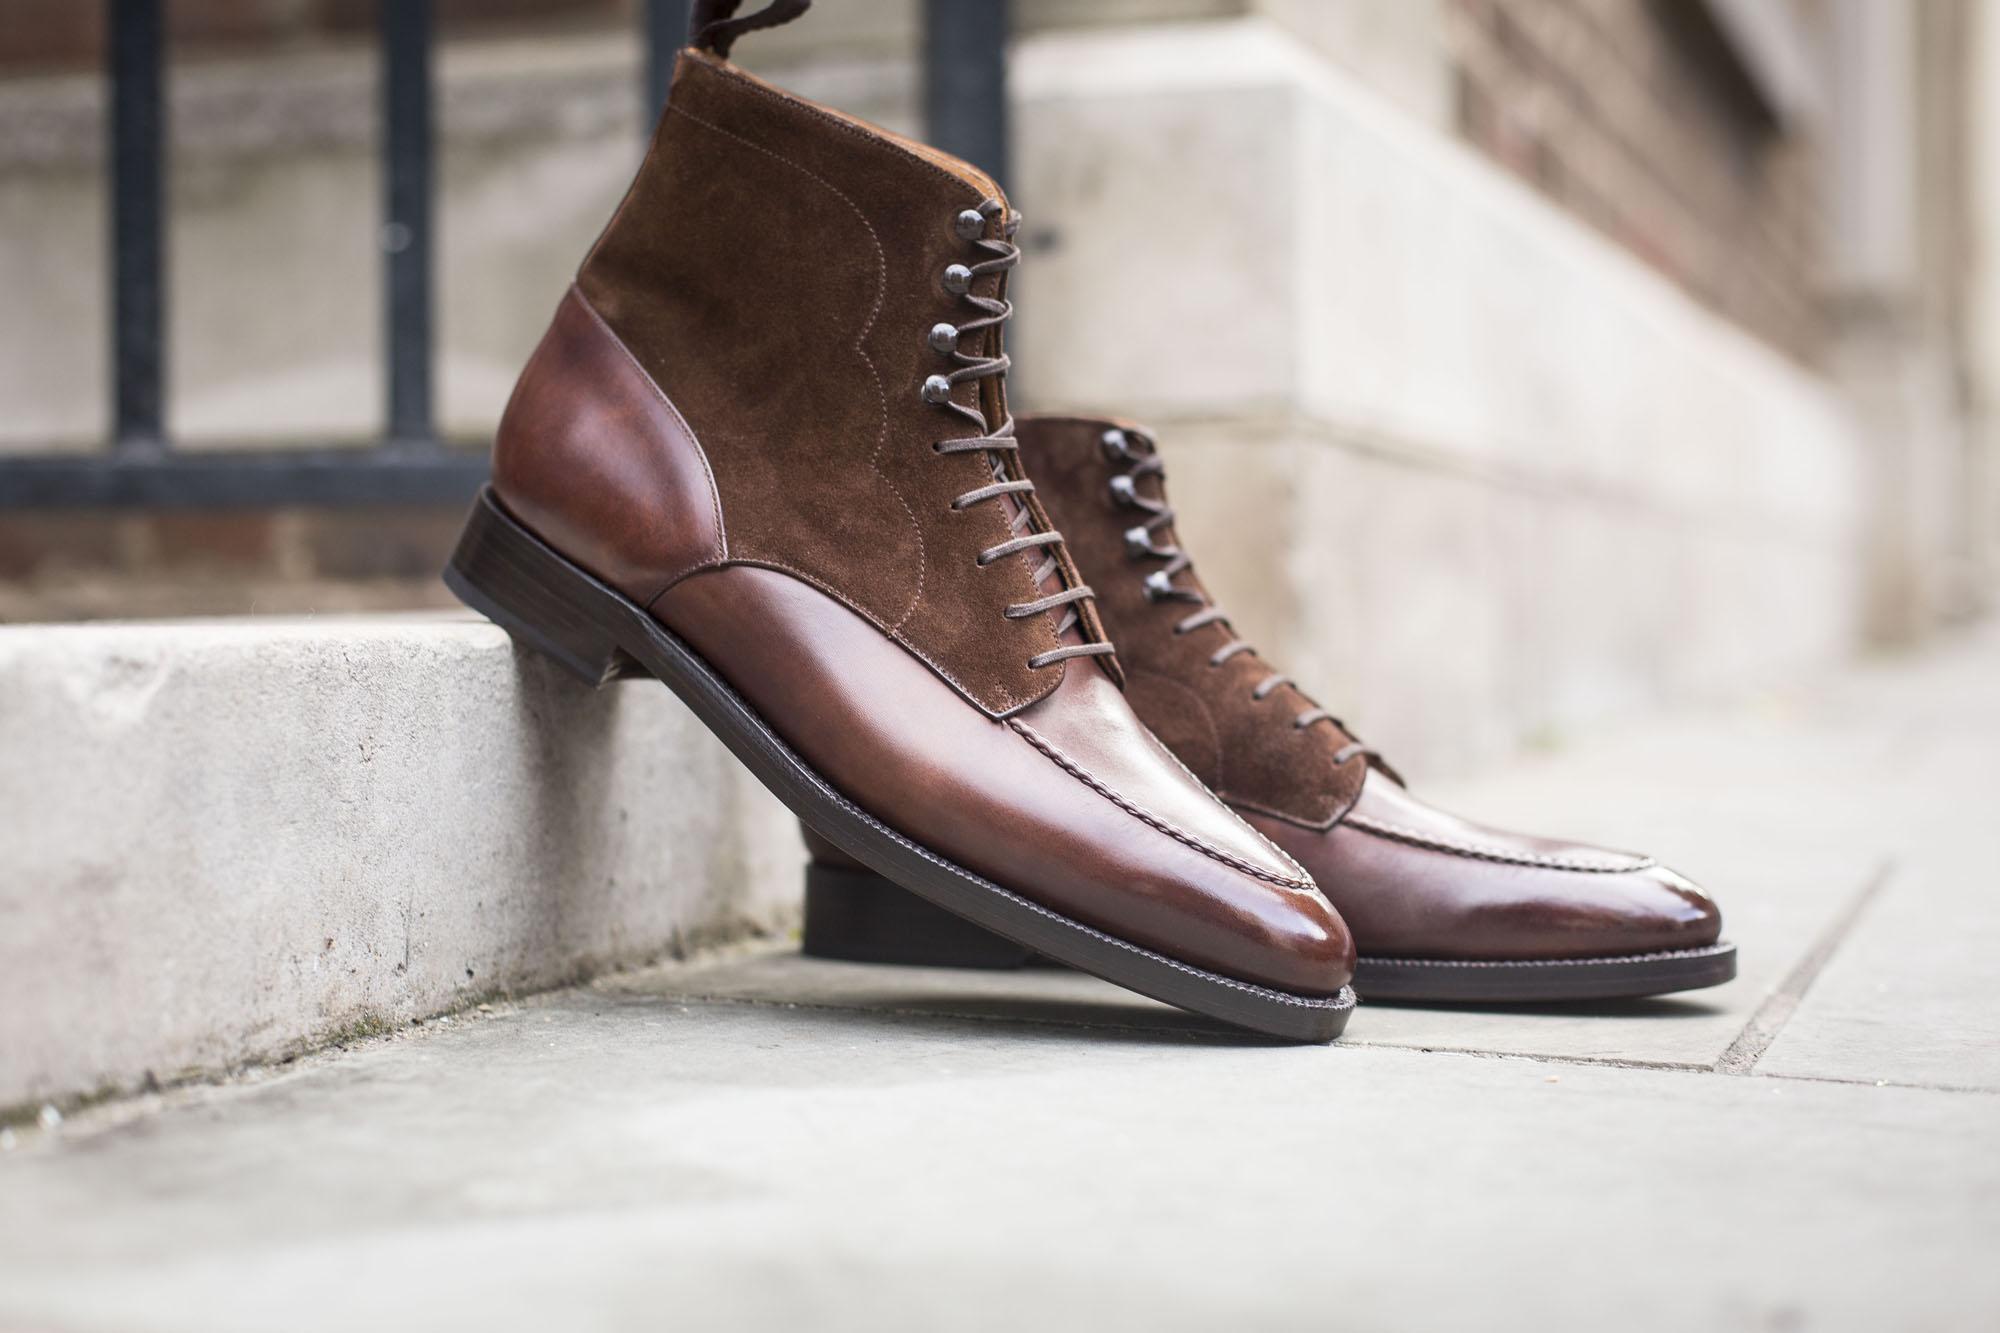 j-fitzpatrick-footwear-collection-12-october-2018-hero-00057.jpg